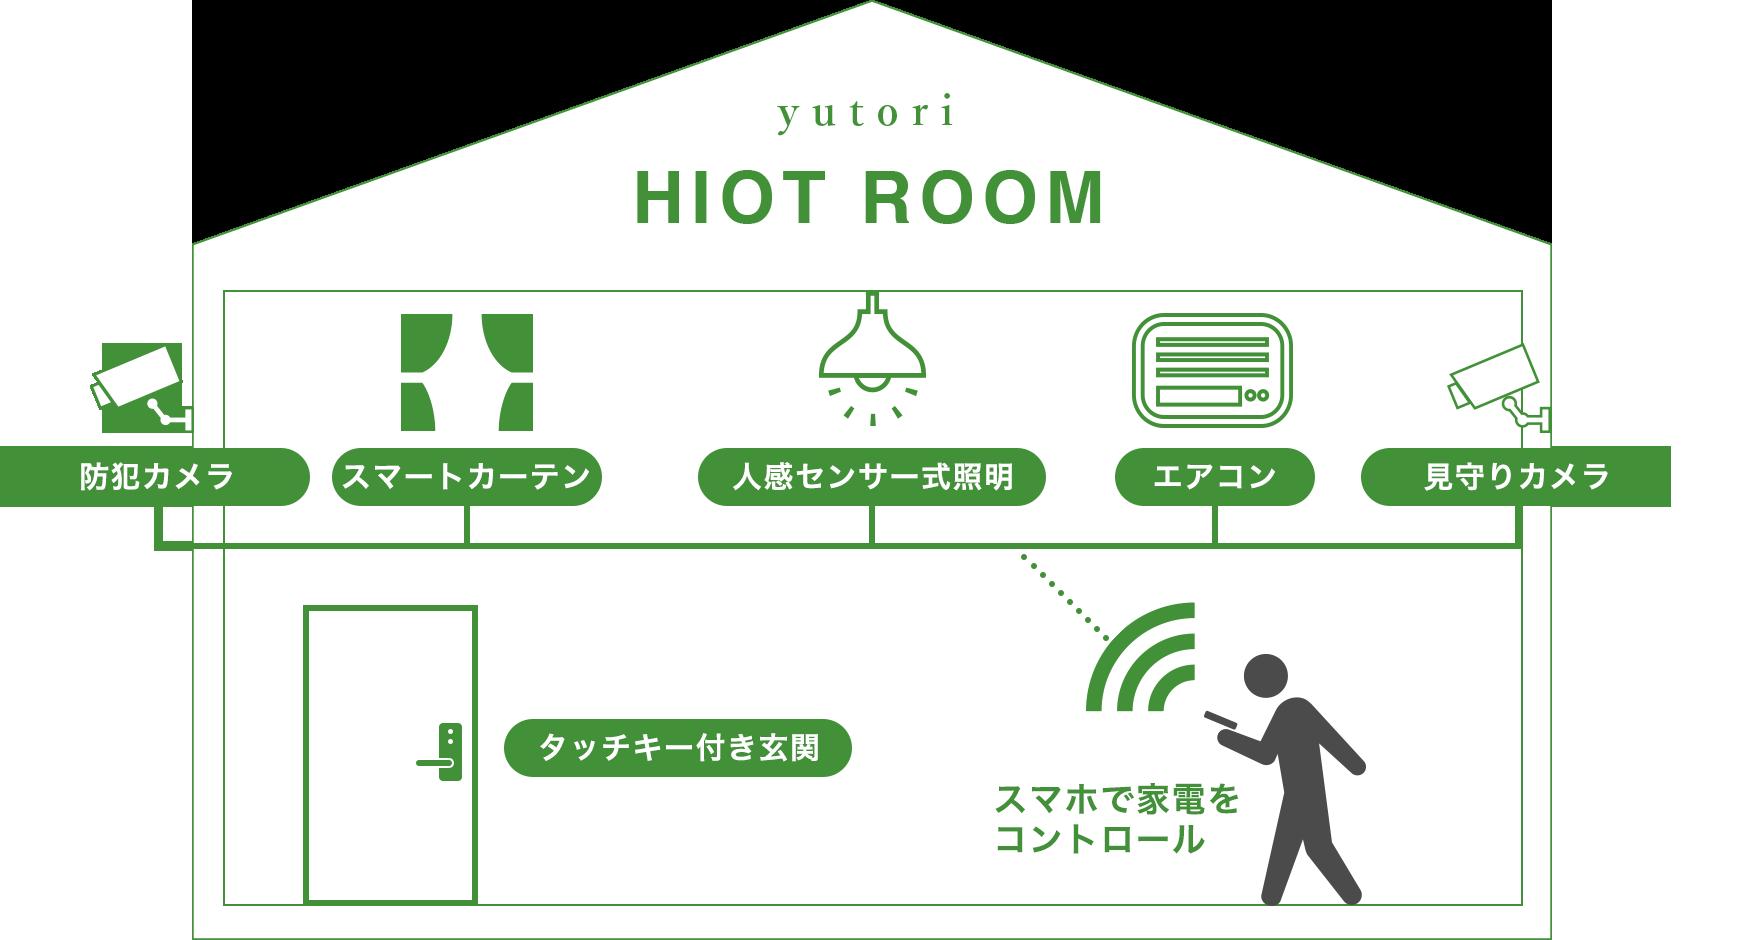 HIOT ROOM